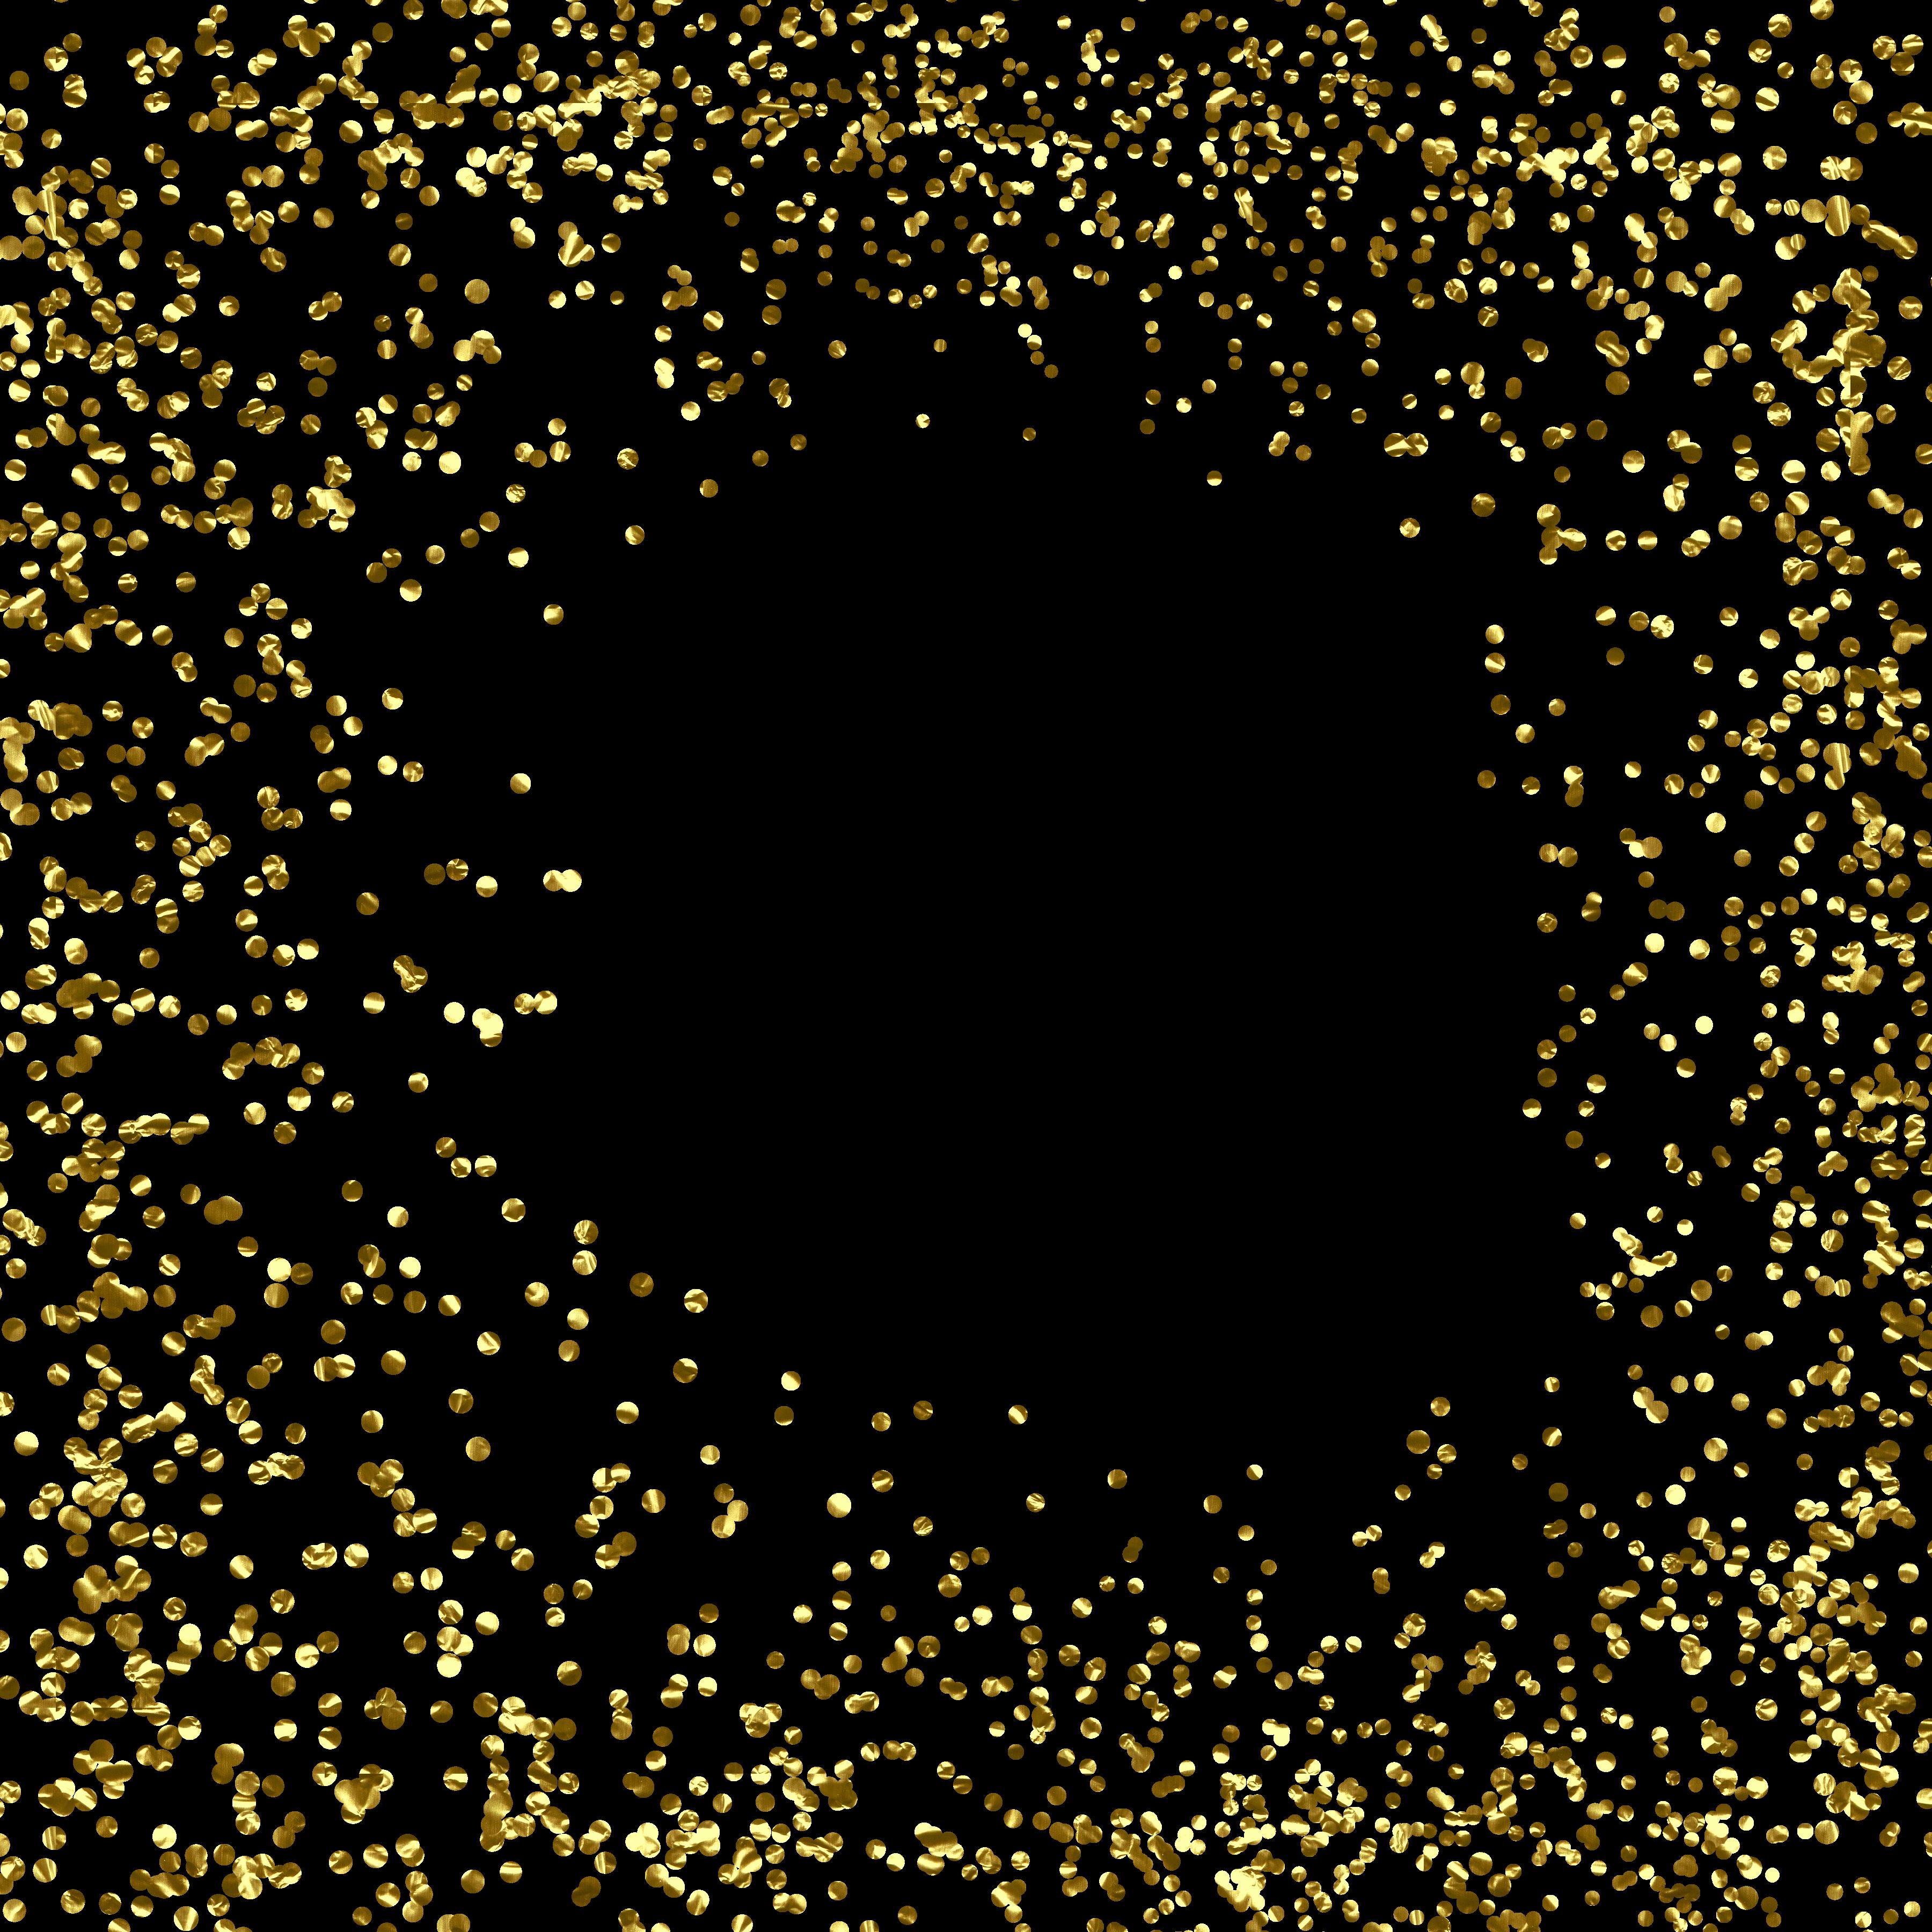 Download Gold Glitter Background - Throw Kindness Around ...